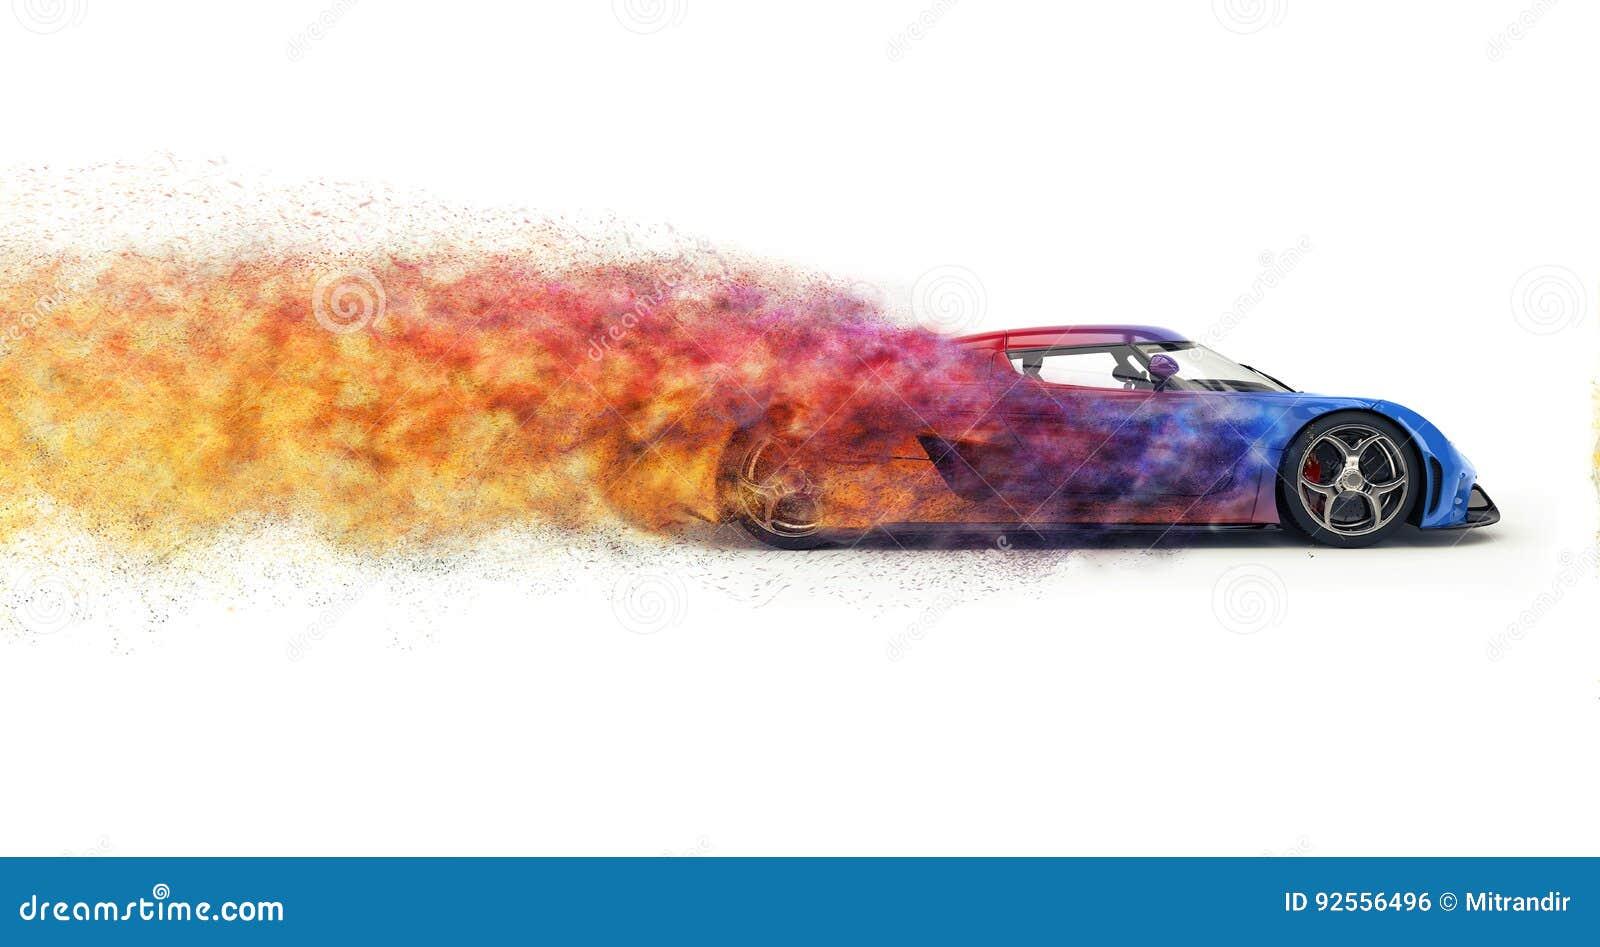 Carro super moderno rápido que desintegra-se em partículas coloridas